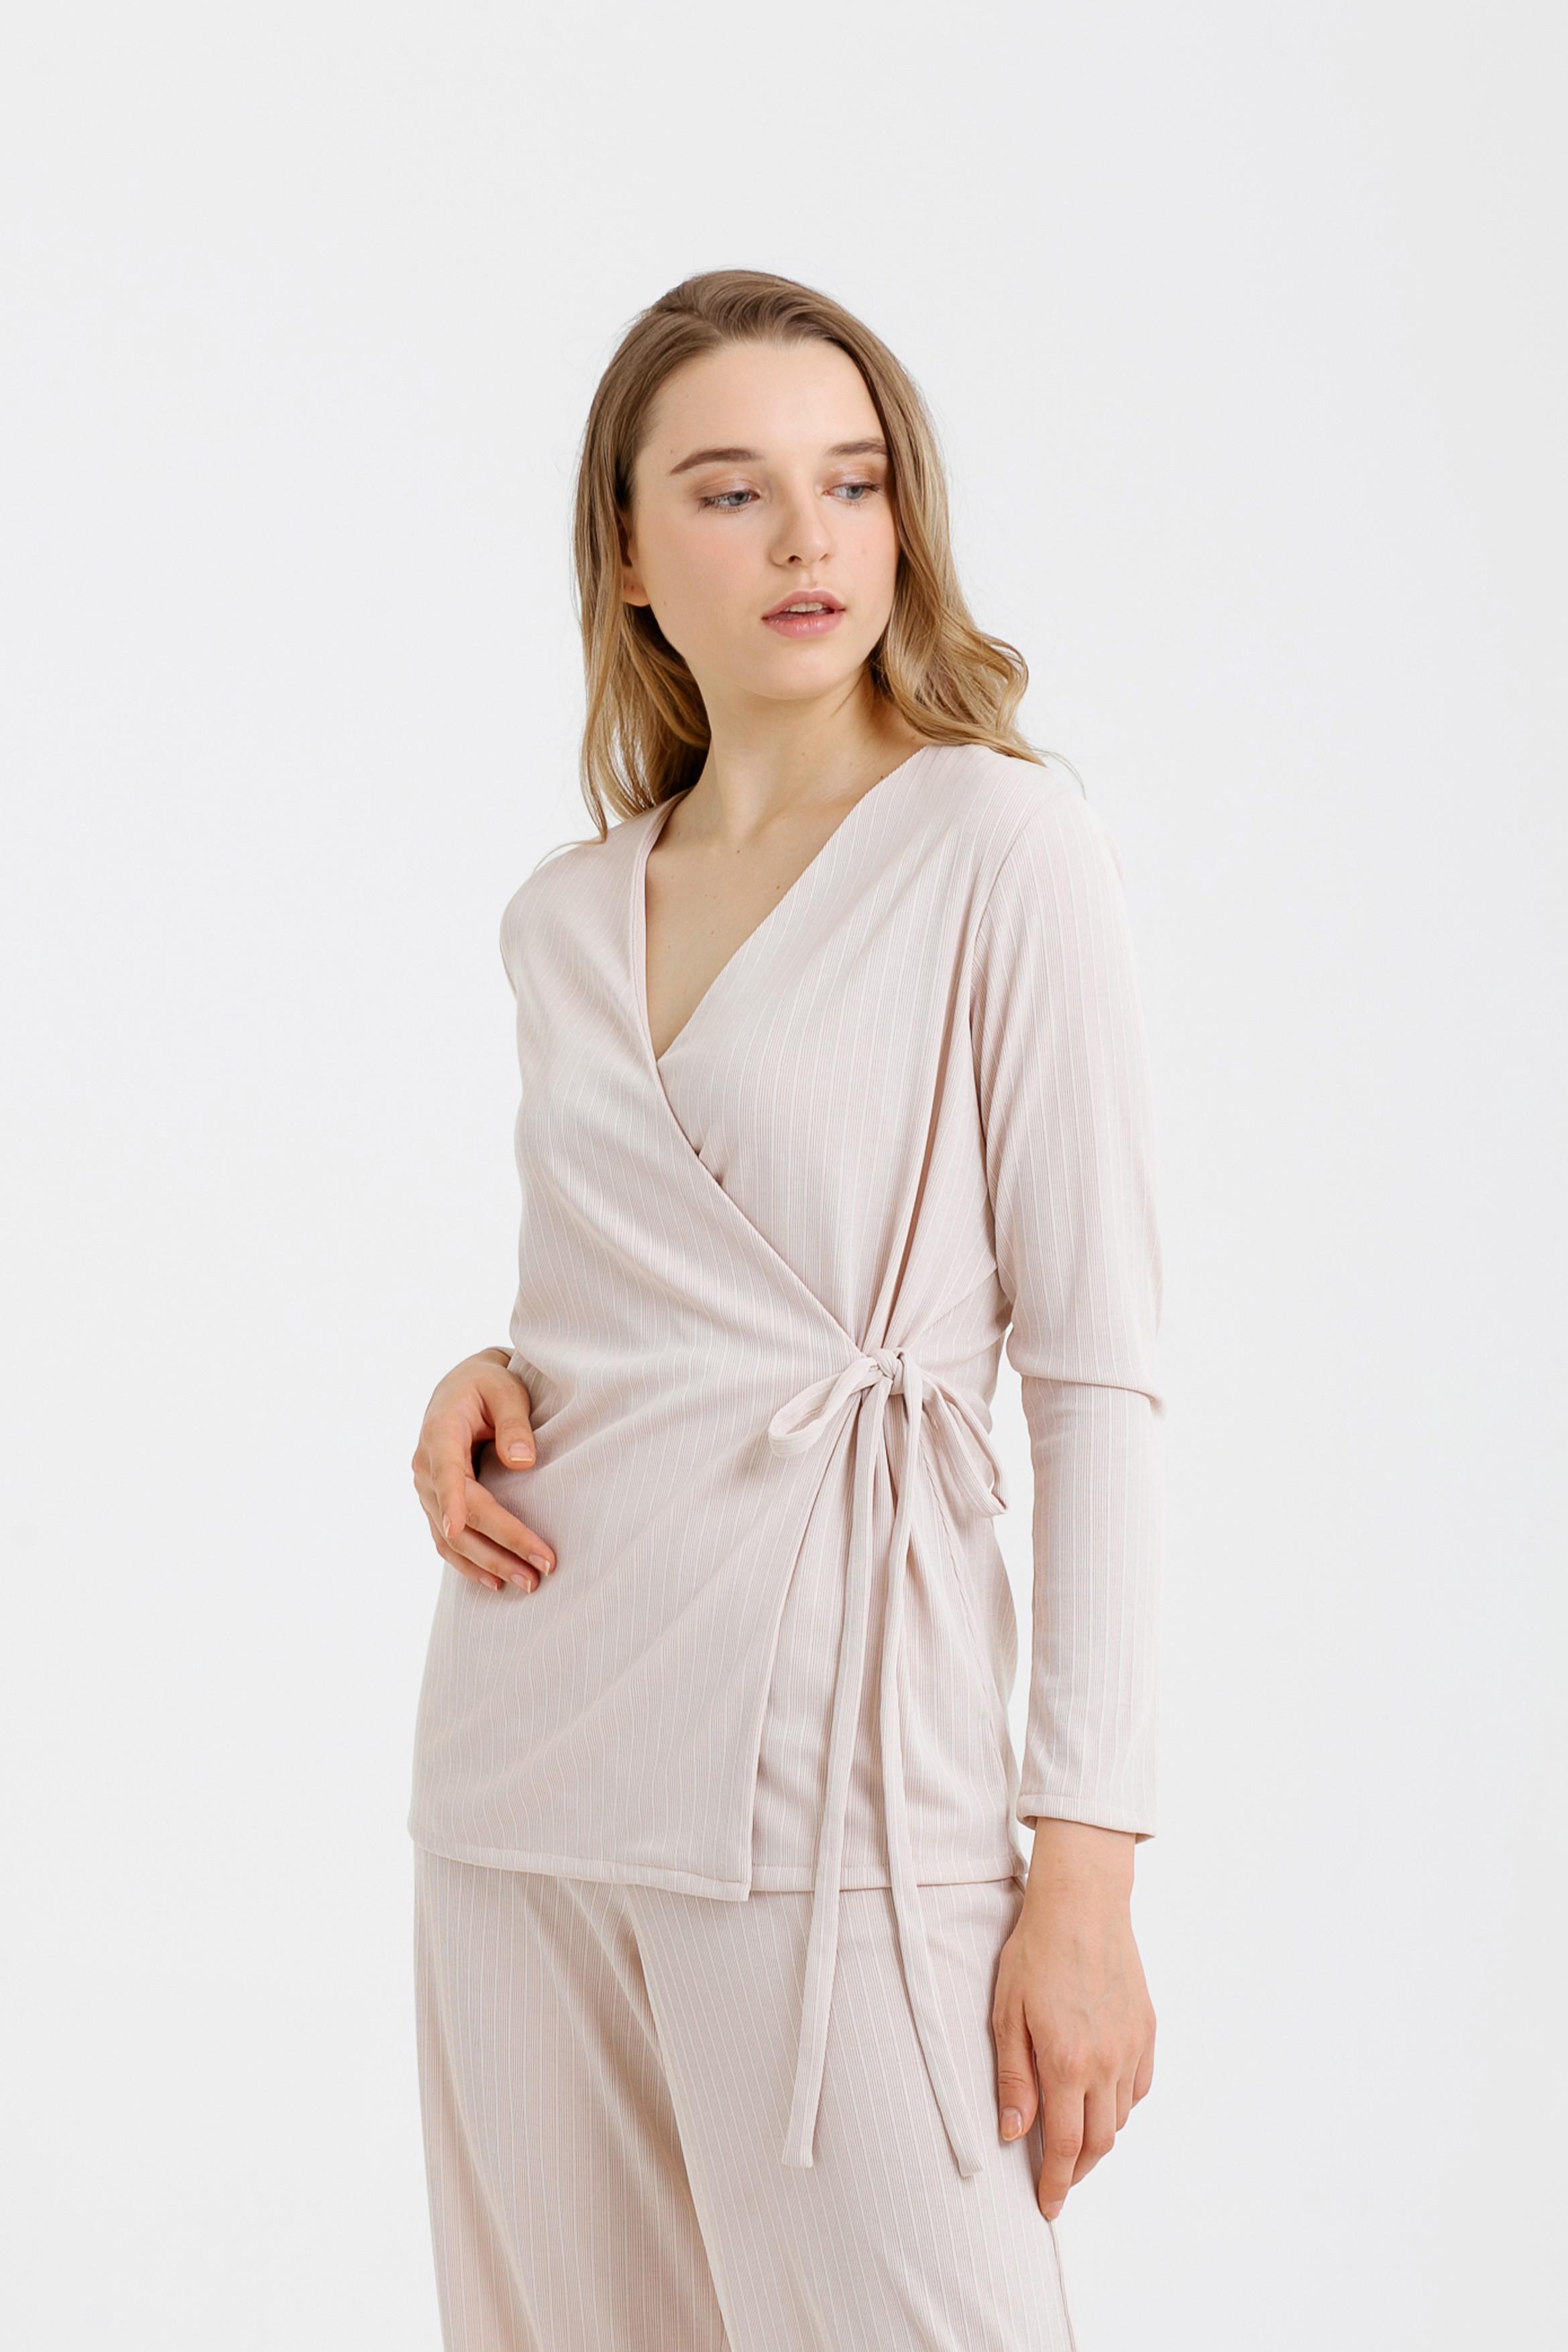 Ribbed Knit Kimono Top/Outer